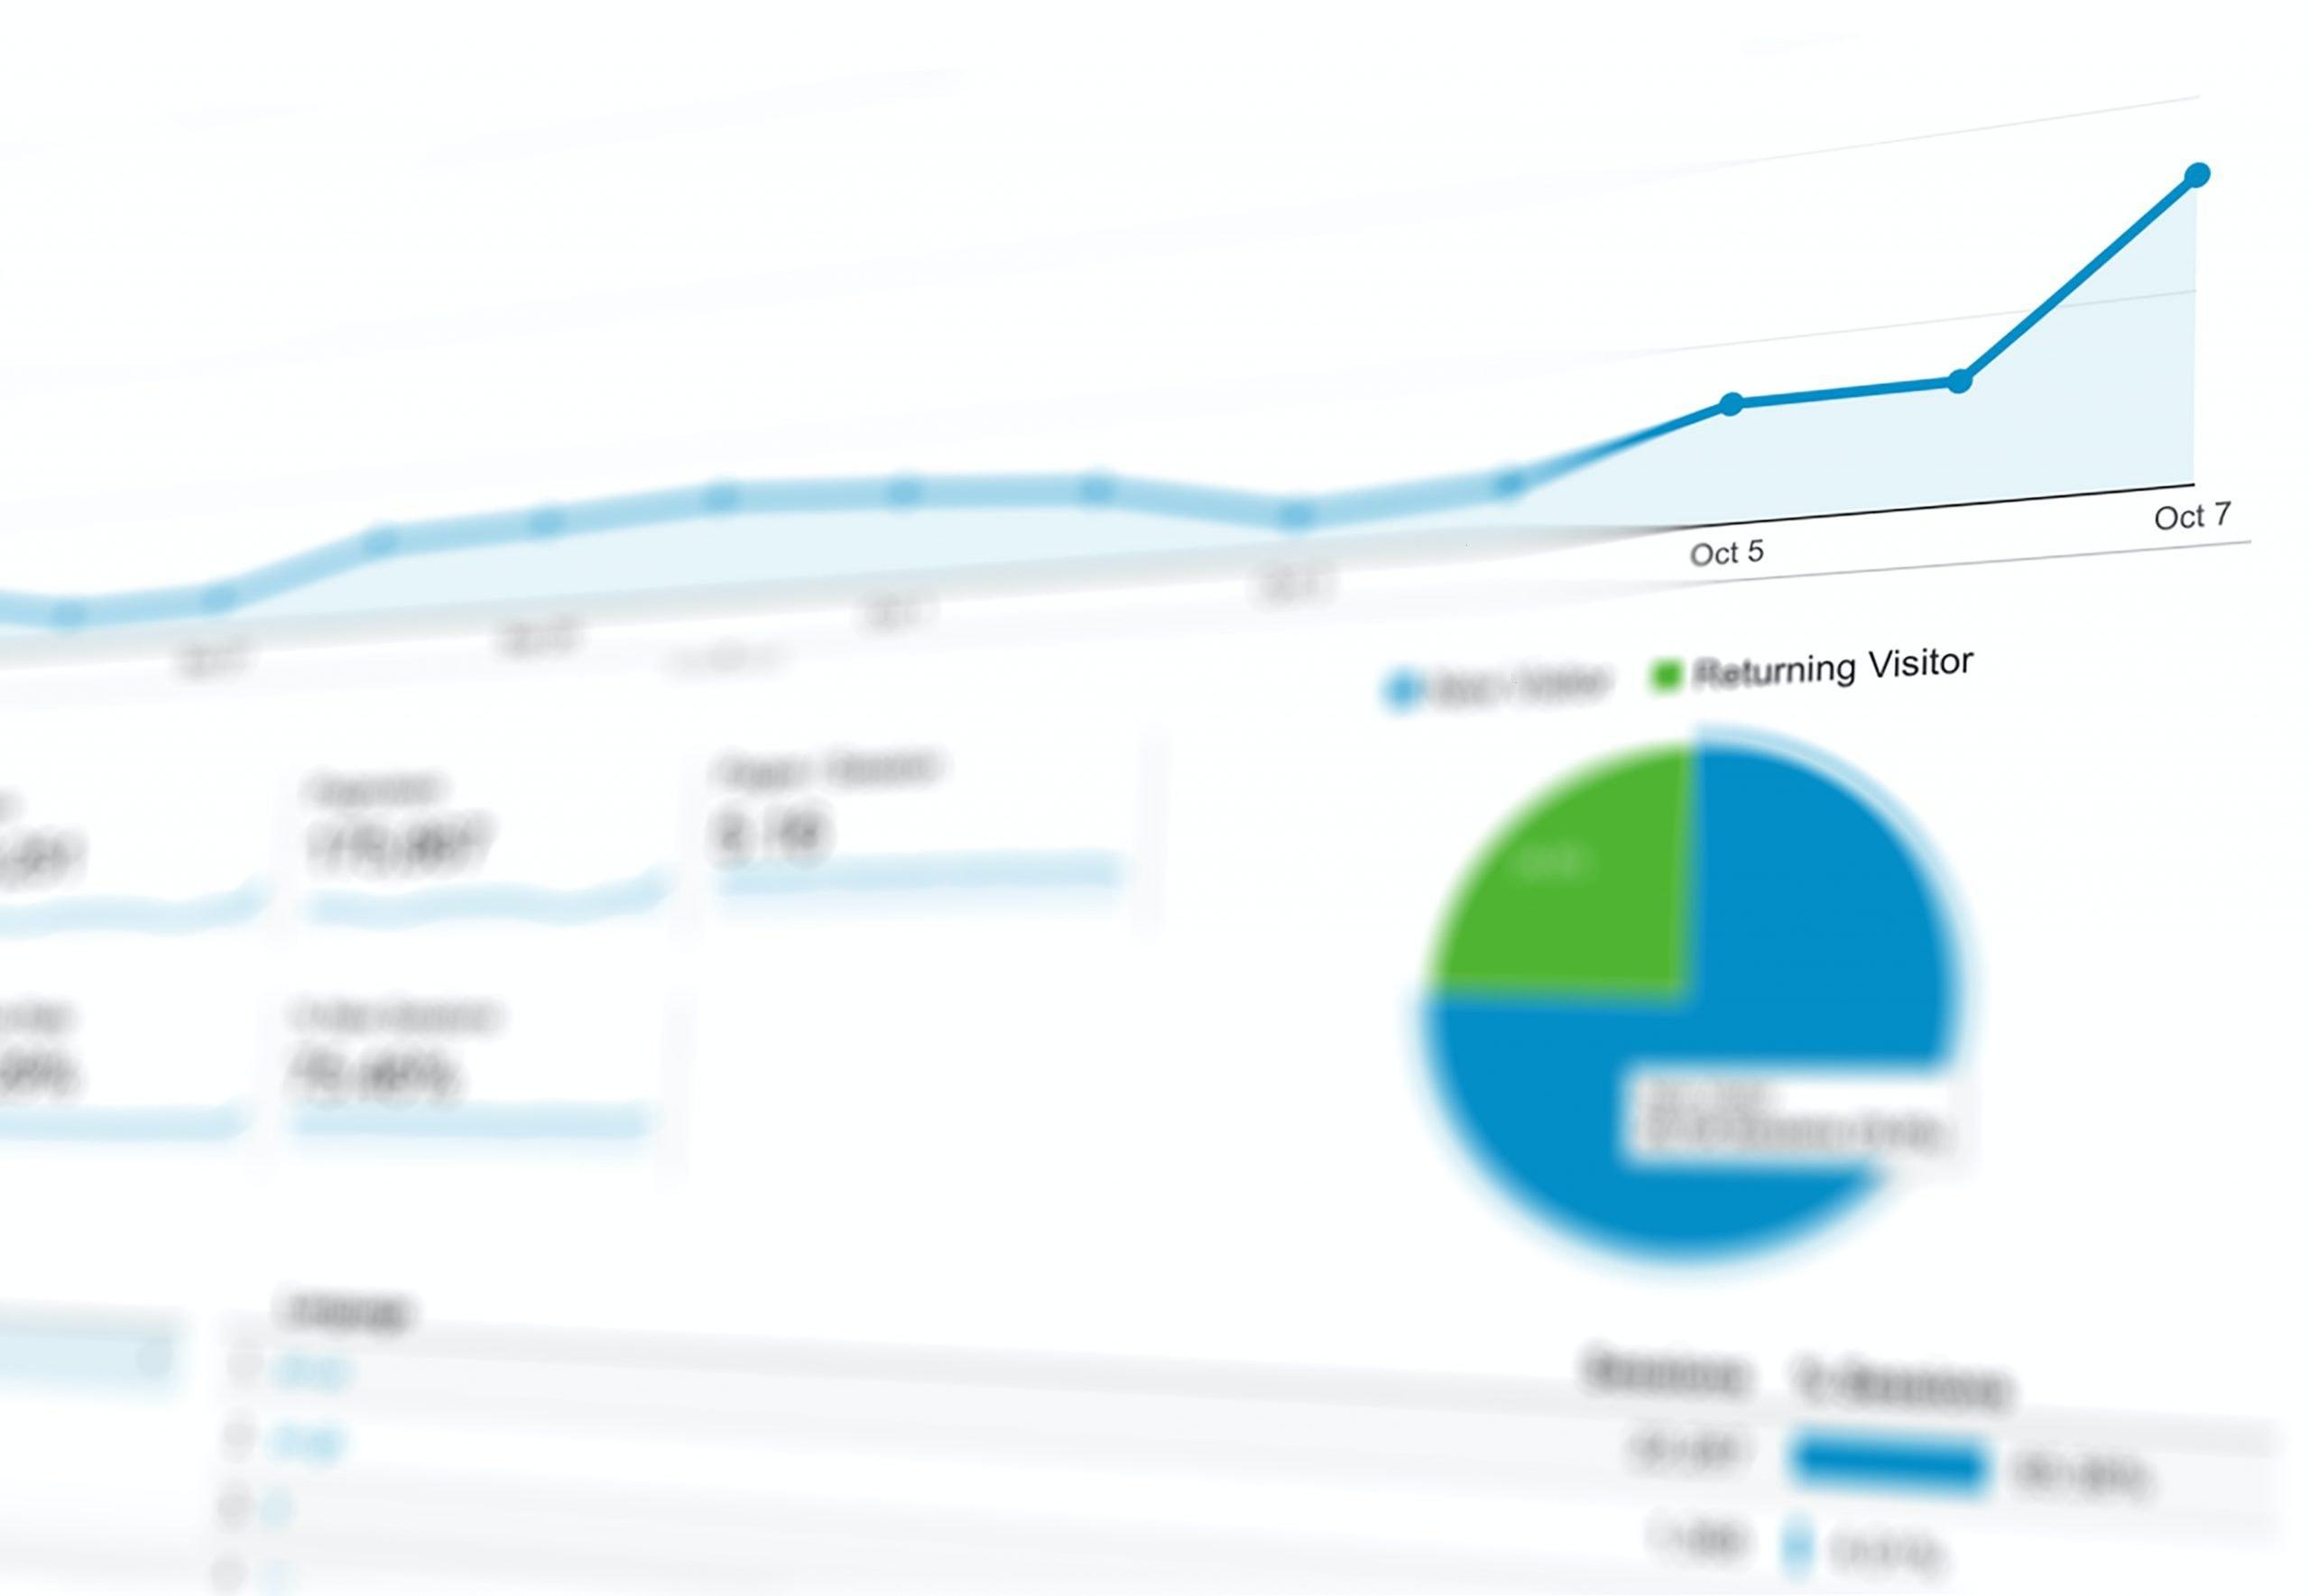 Google Analytics (slightly blurry)